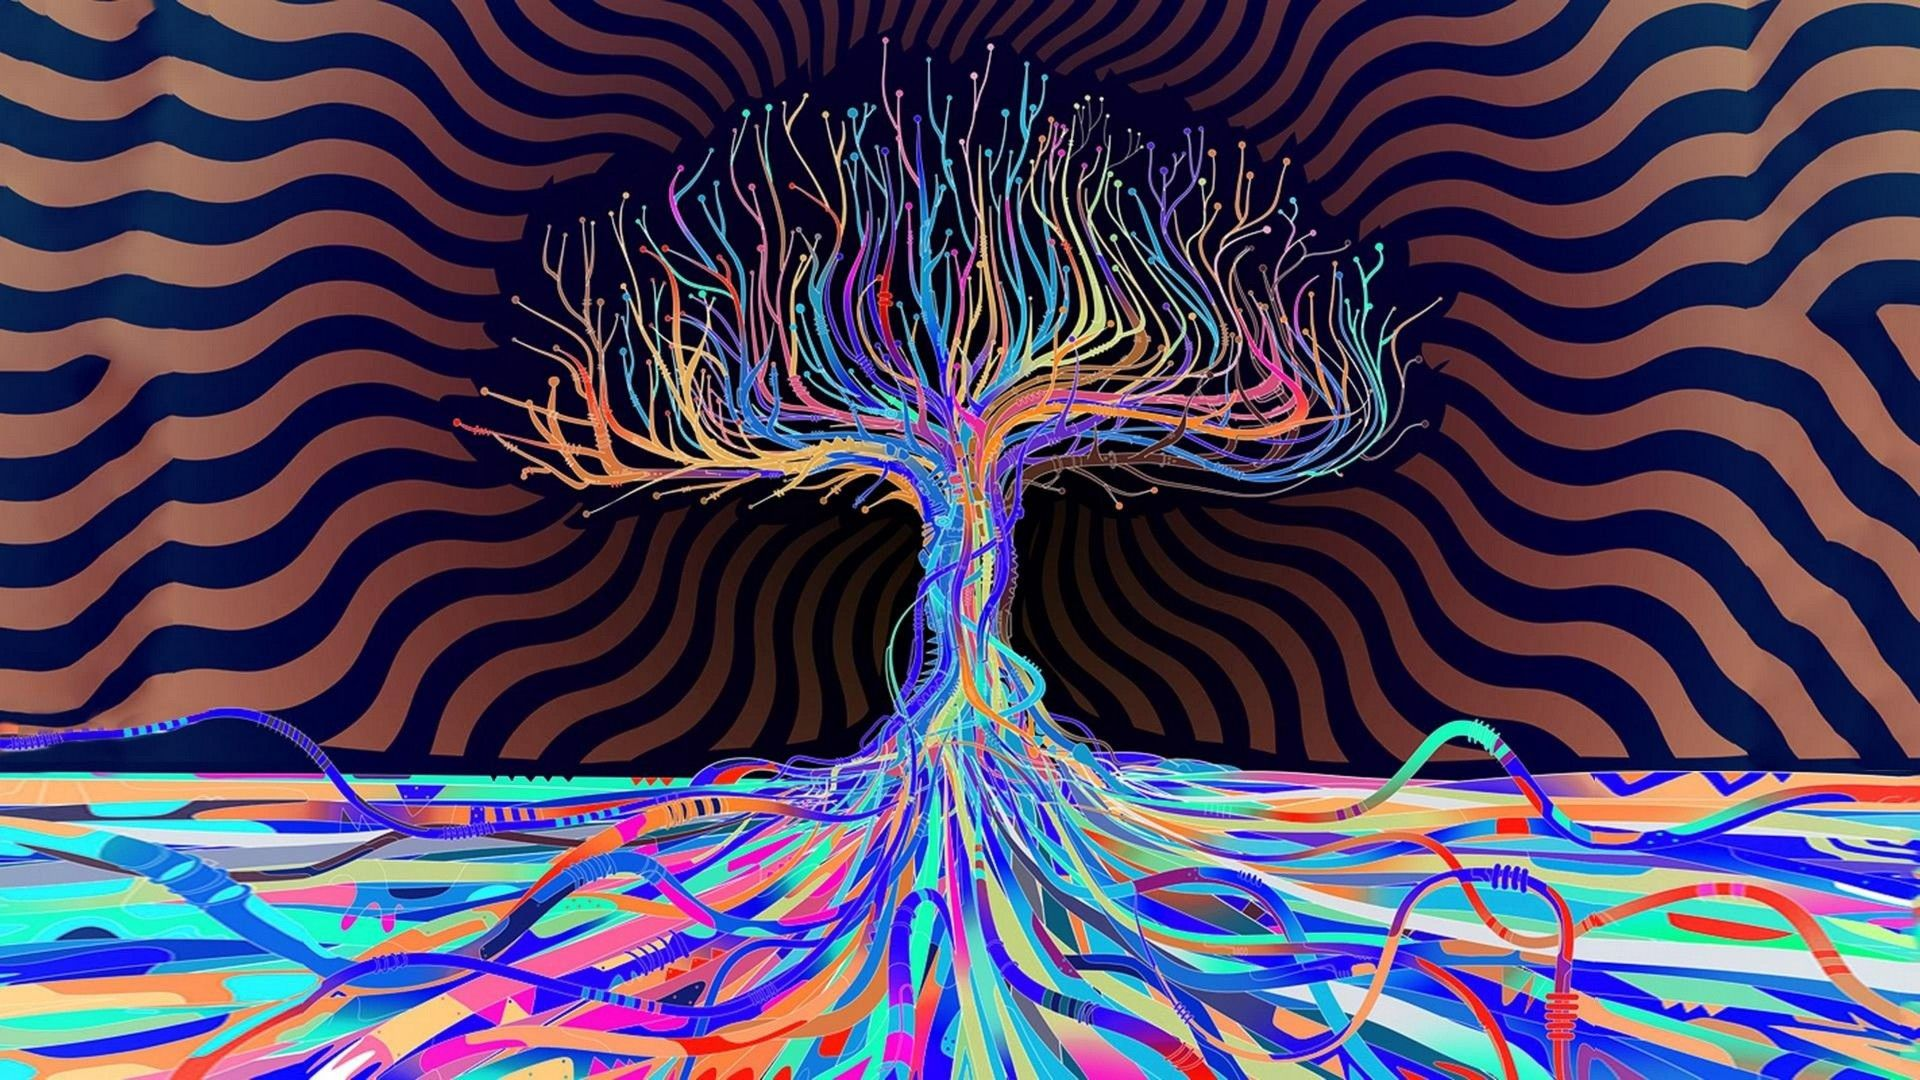 Best Dark Colorful Wallpaper Hd 2021 Live Wallpaper Hd Psychedelic Colors Trippy Wallpaper Art Wallpaper